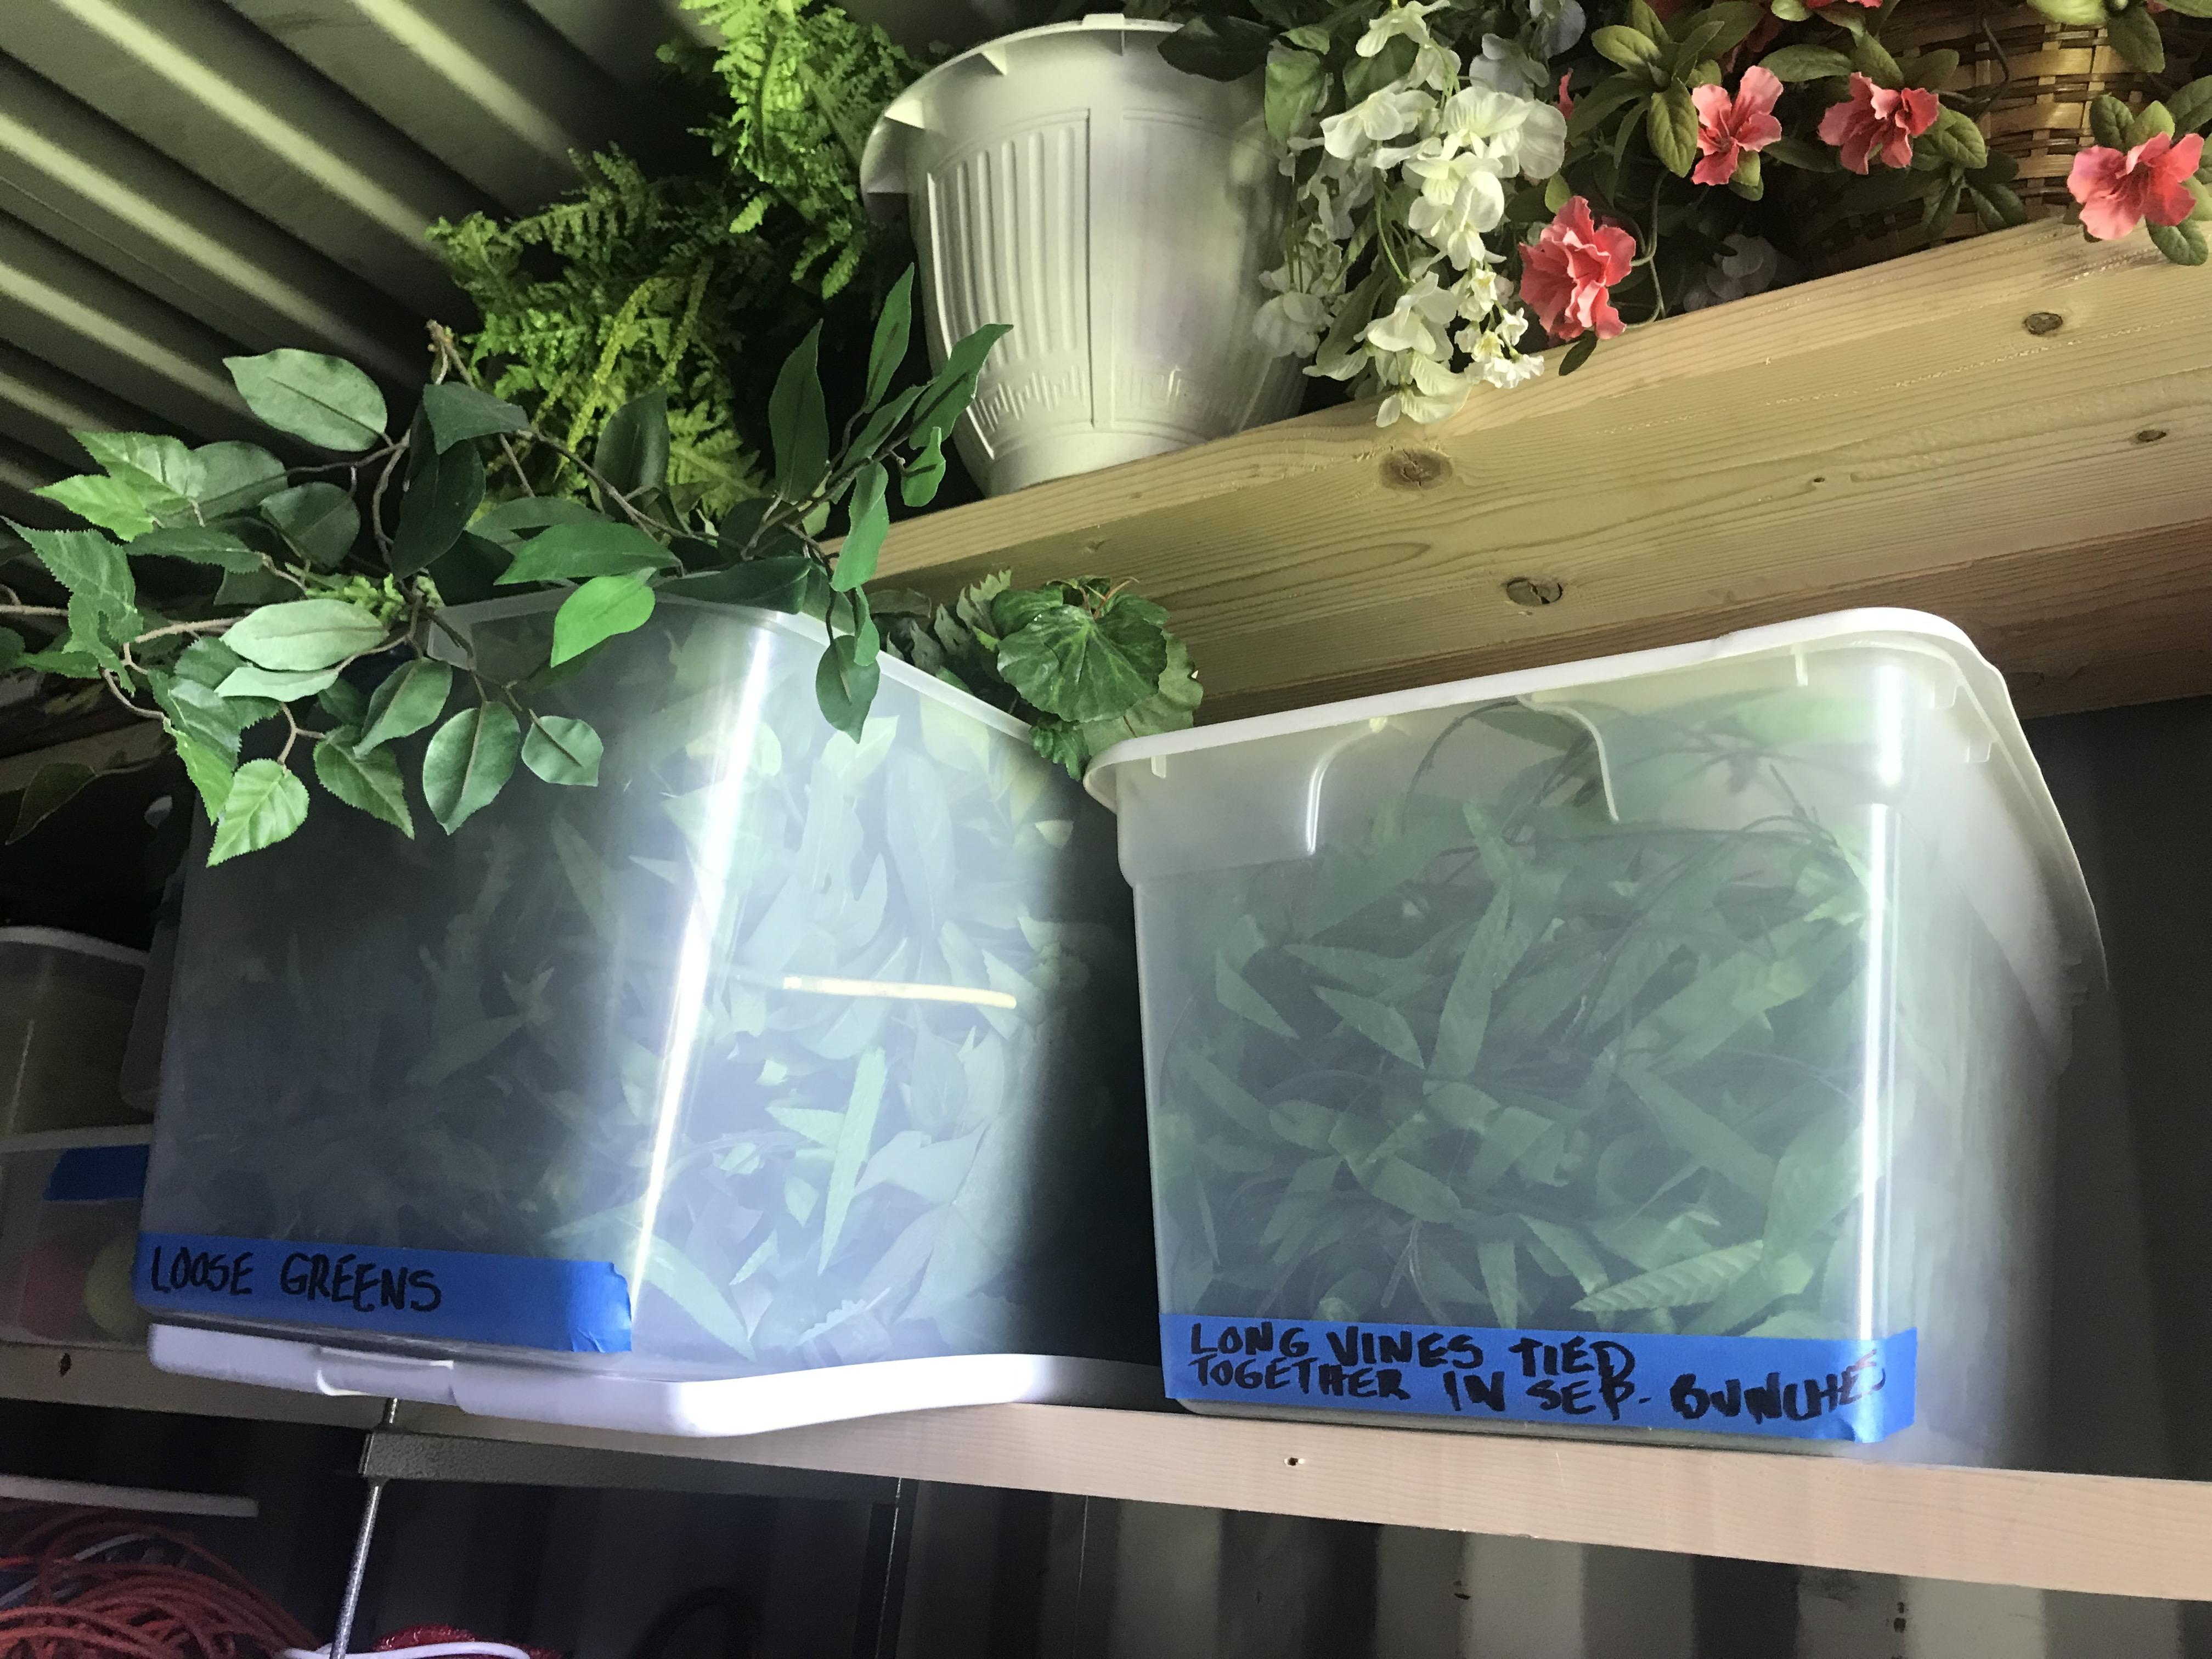 Plants - flowers, Vines